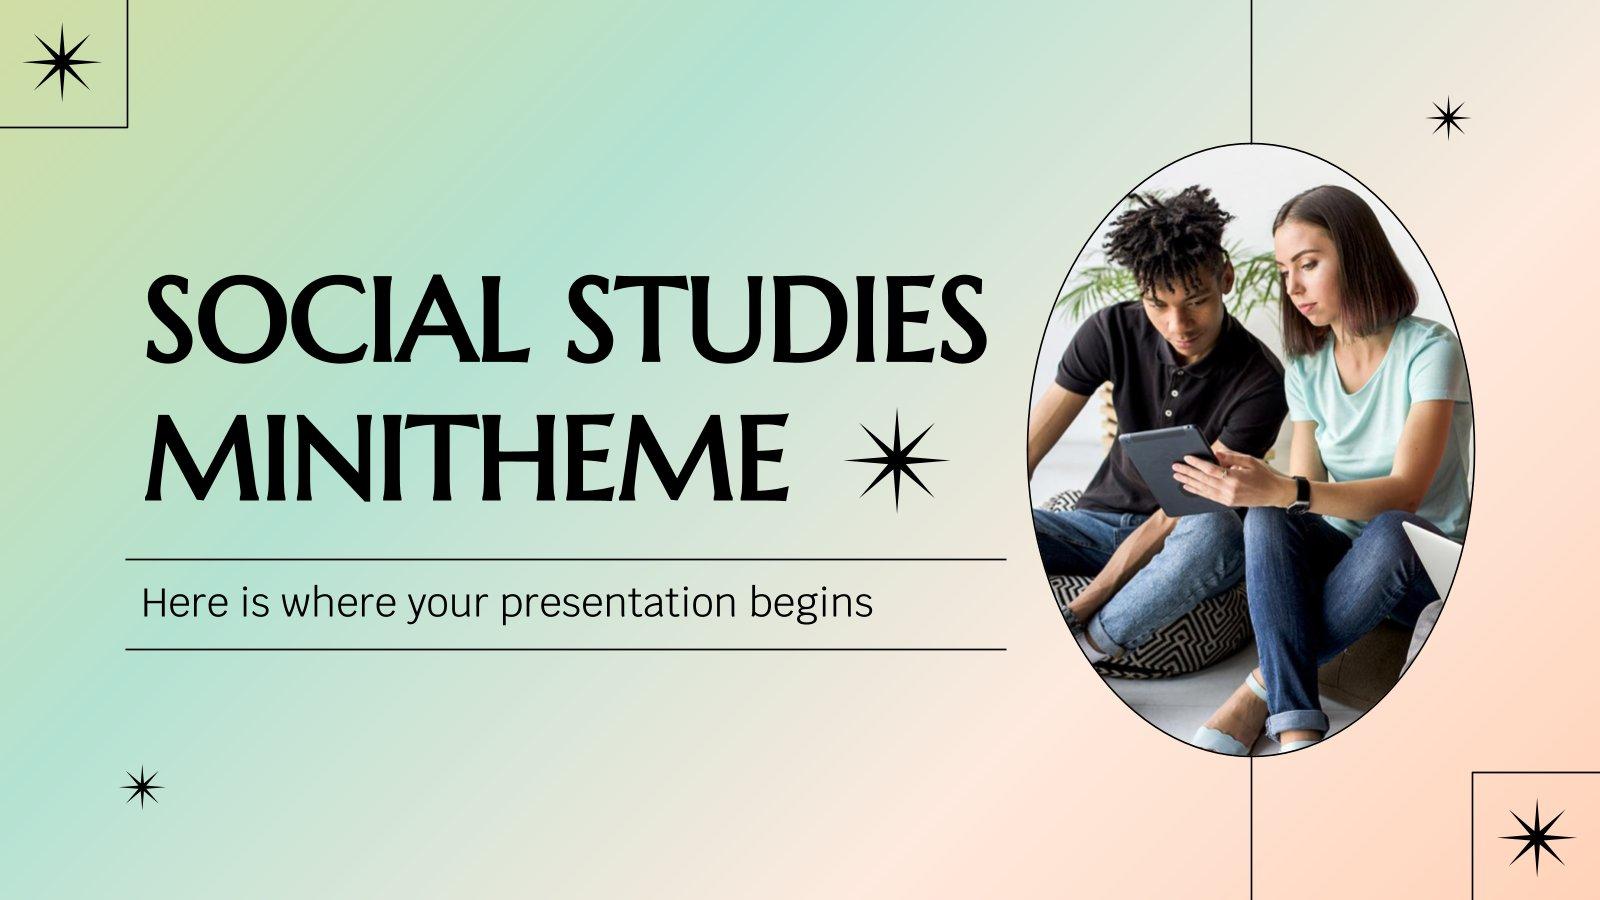 Social Studies Minitheme presentation template